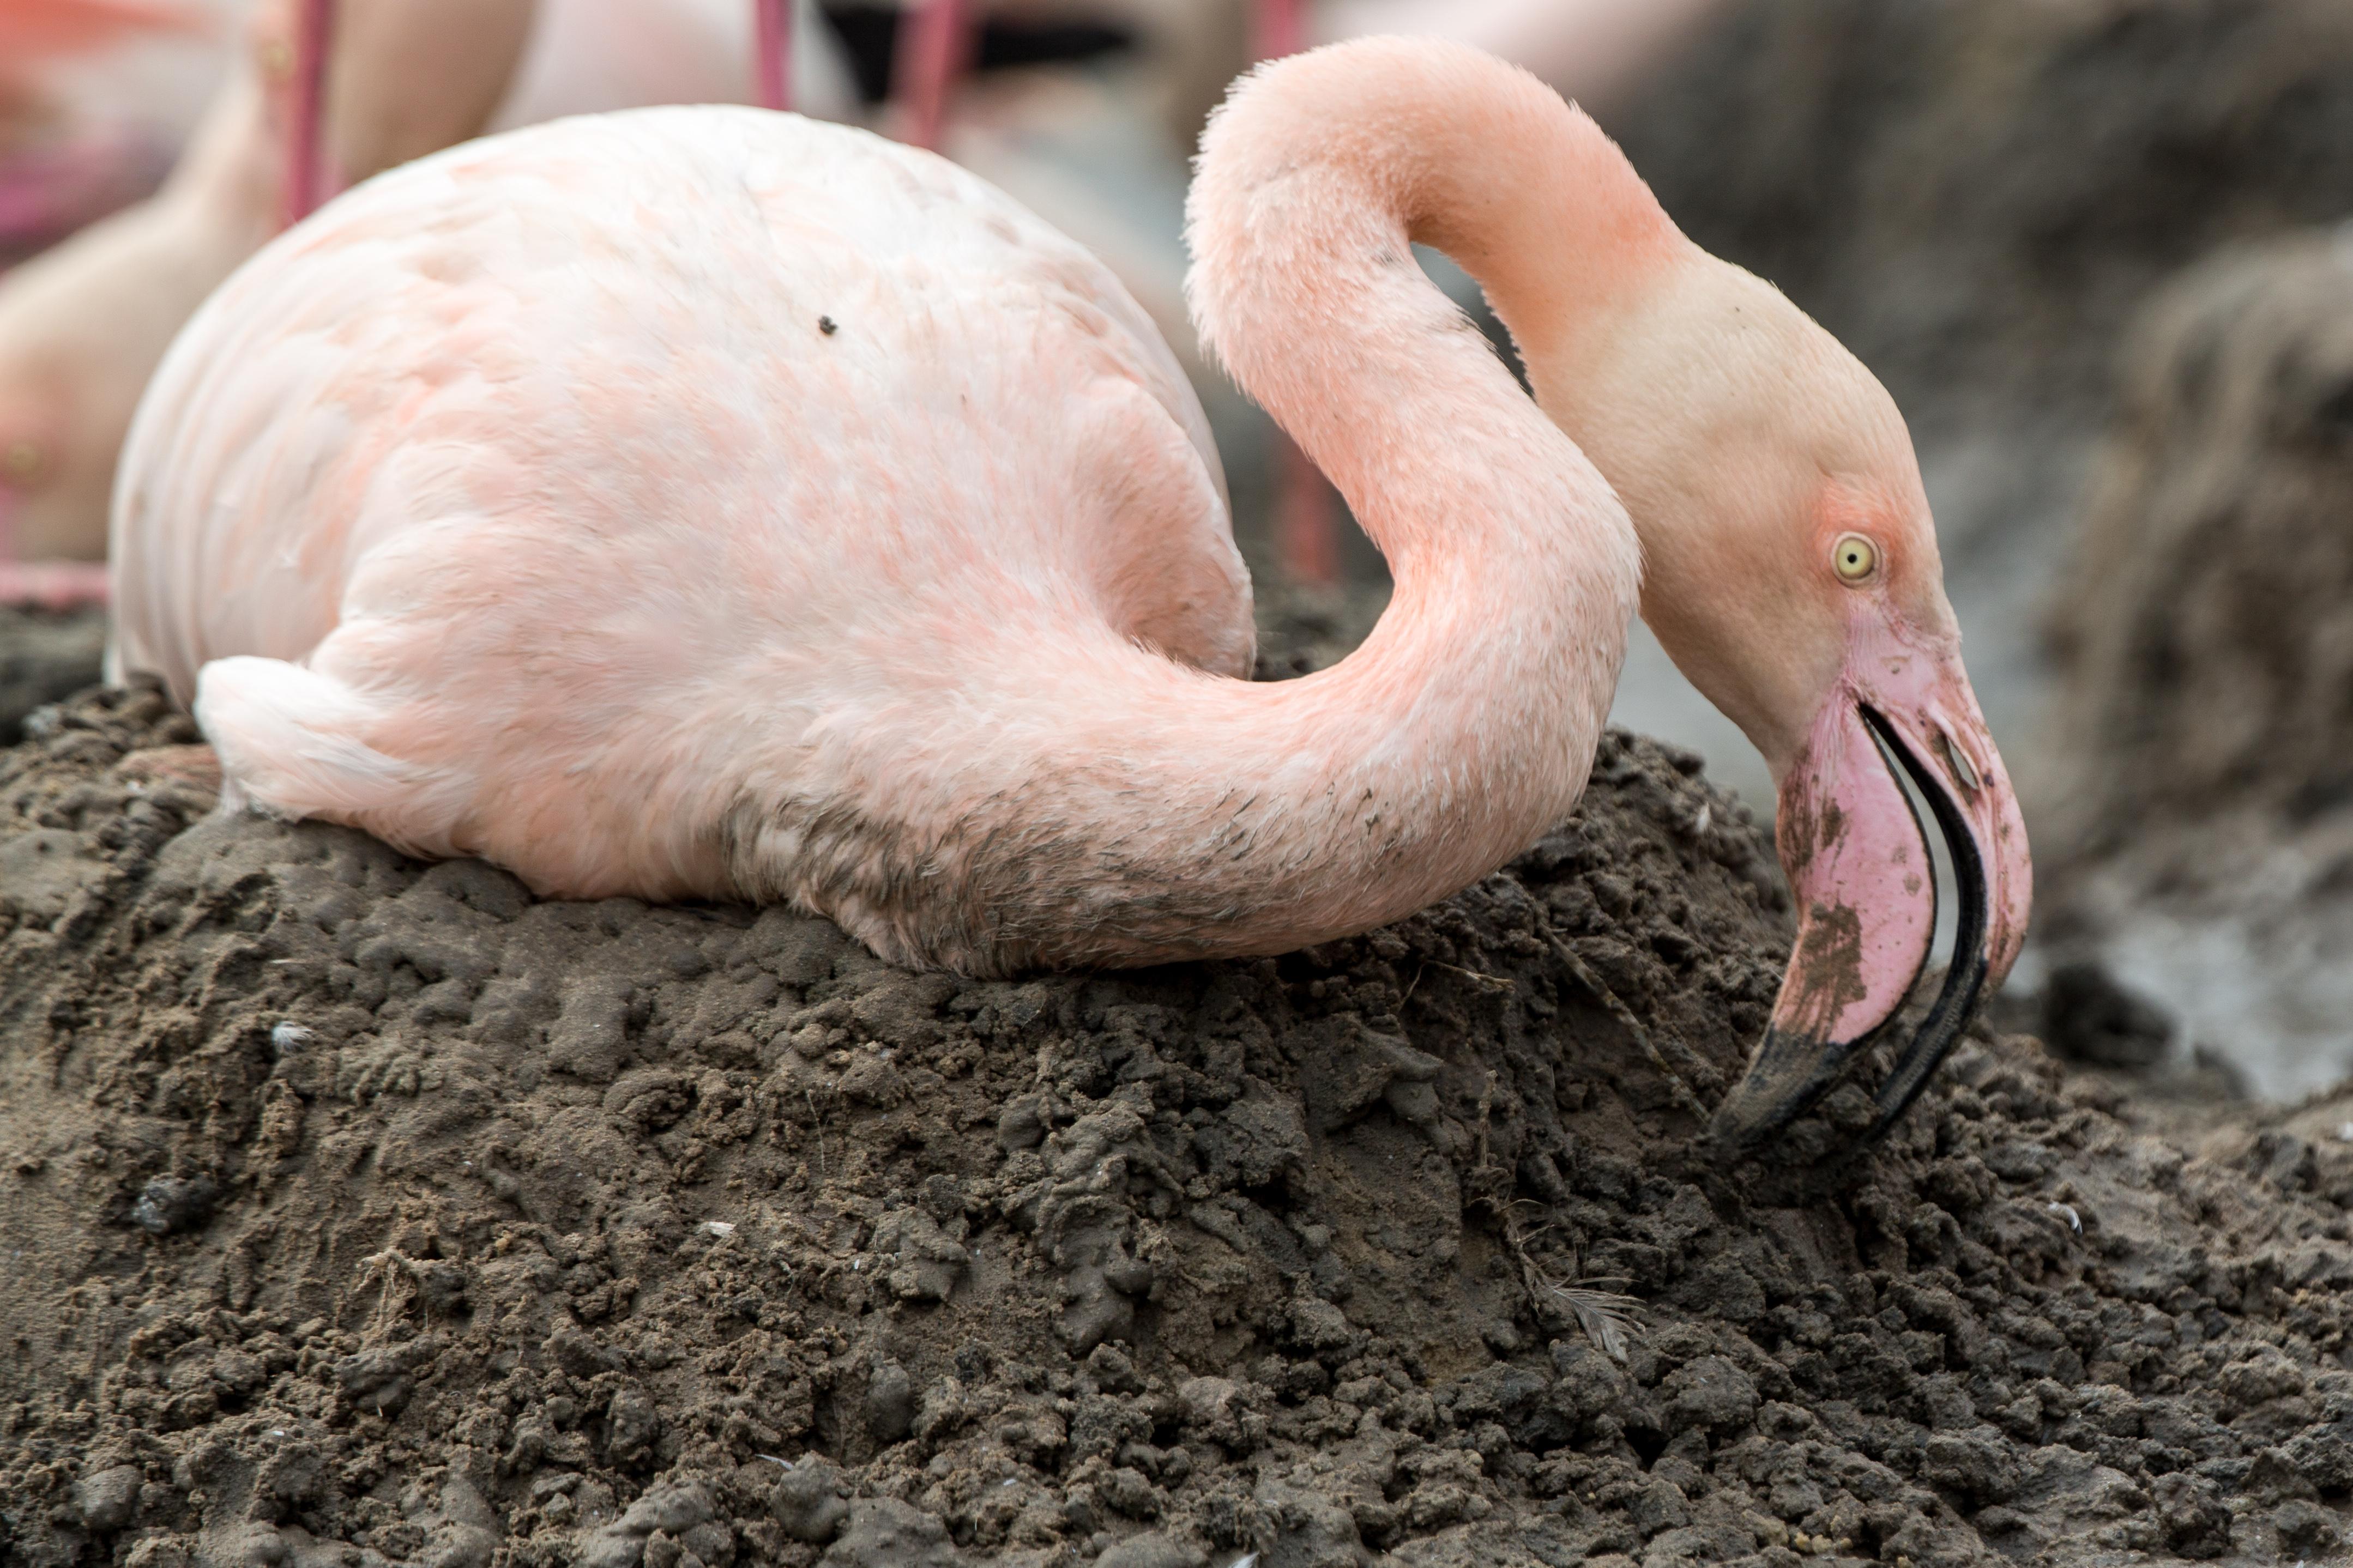 Flamingo nest - photo#19